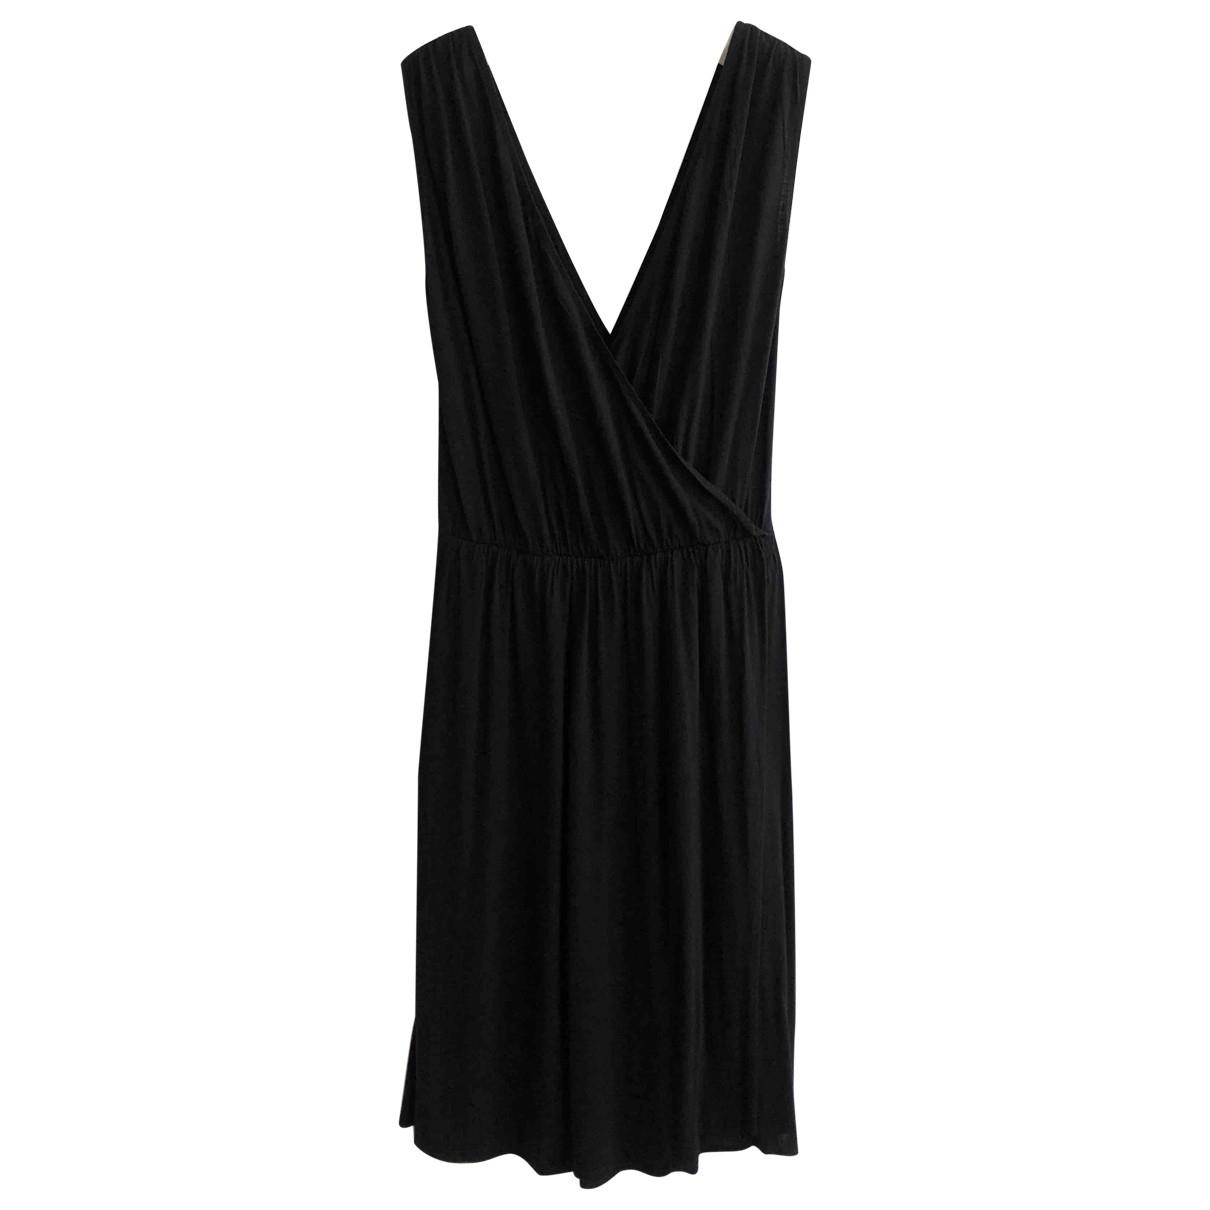 Maison Martin Margiela \N Black Cotton - elasthane dress for Women 42 IT